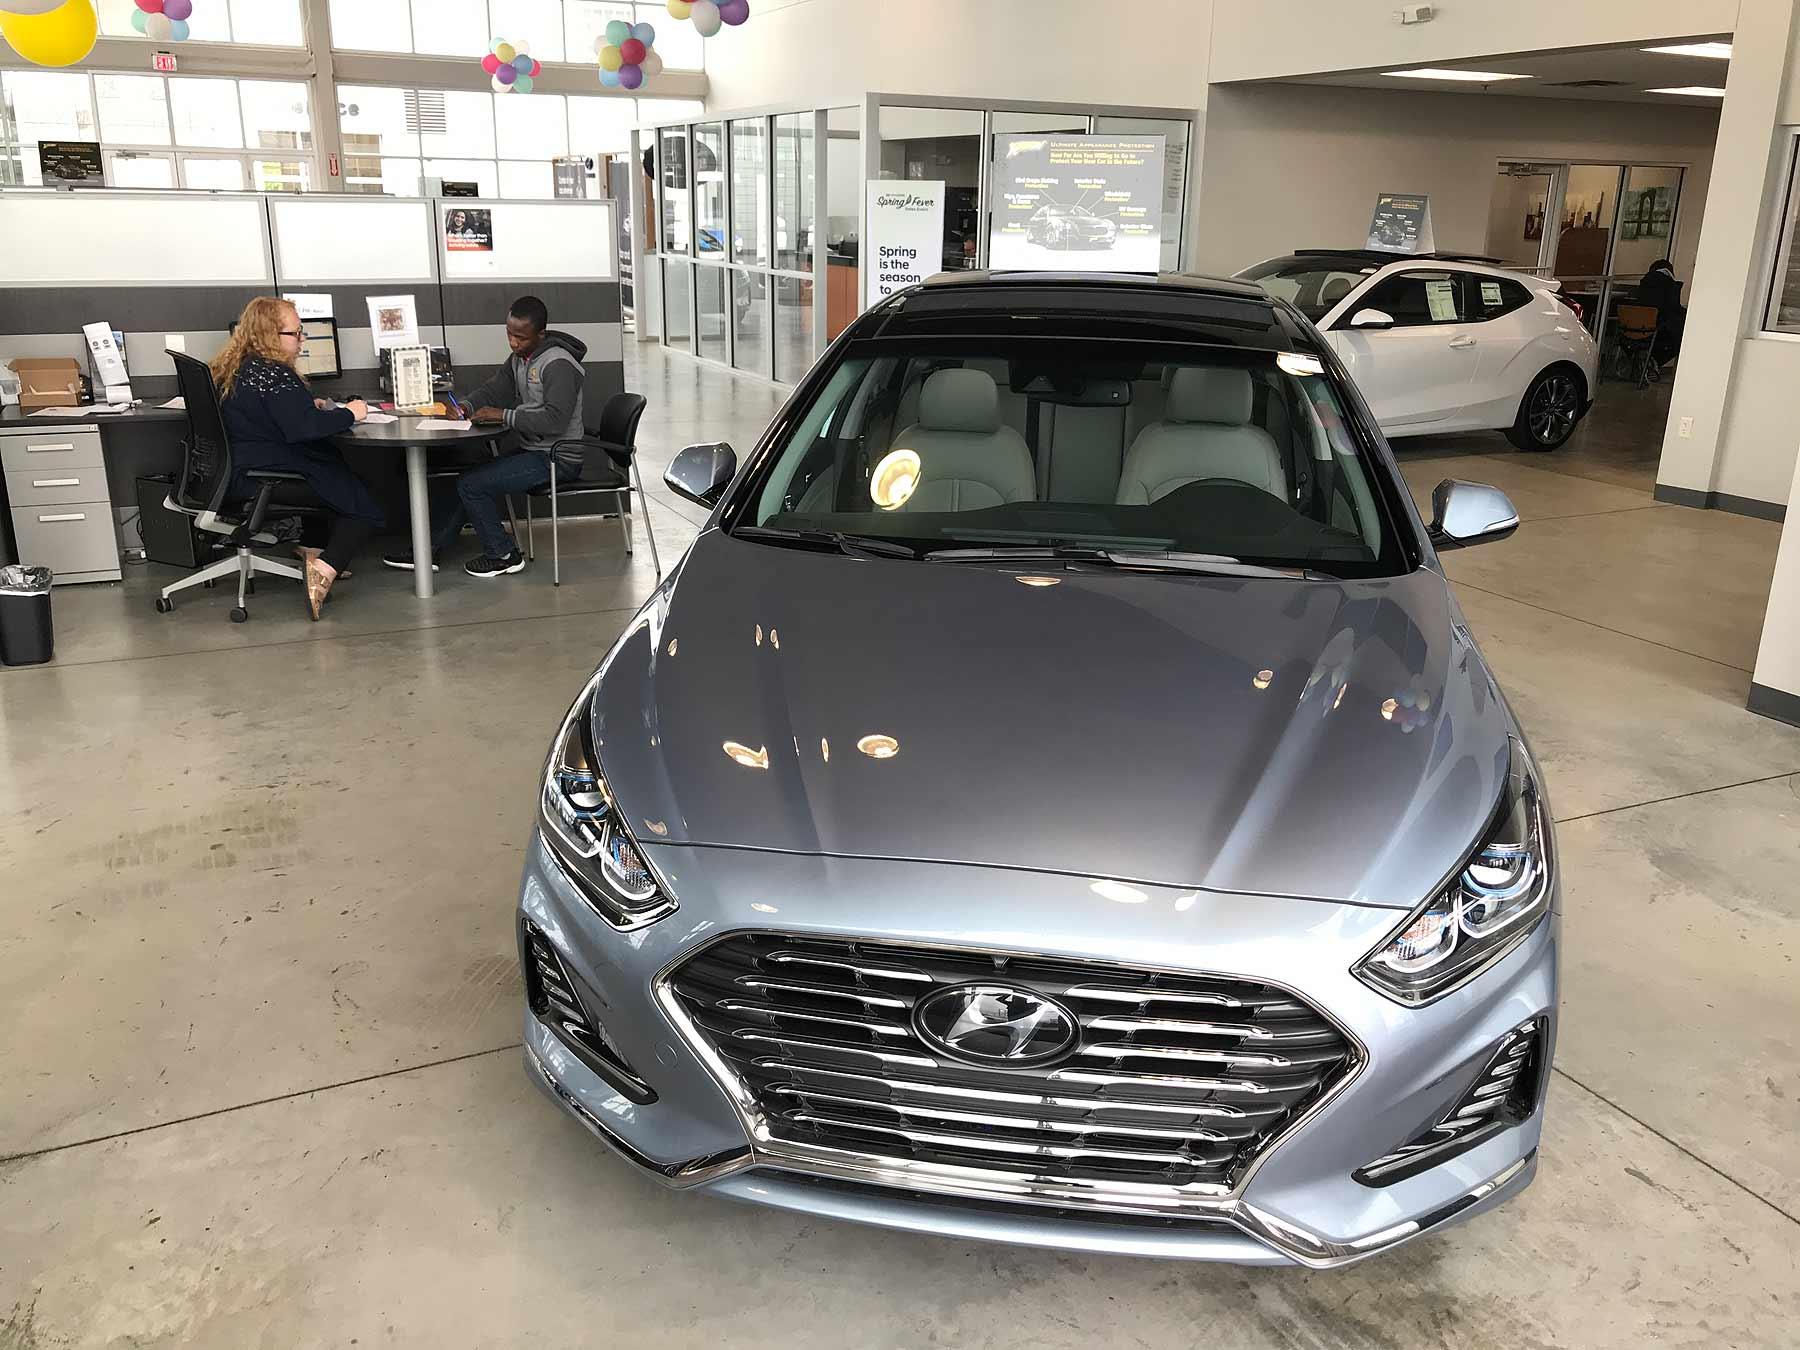 Hyundai Dealership Los Angeles >> Hyundai Kia April Sales Rise